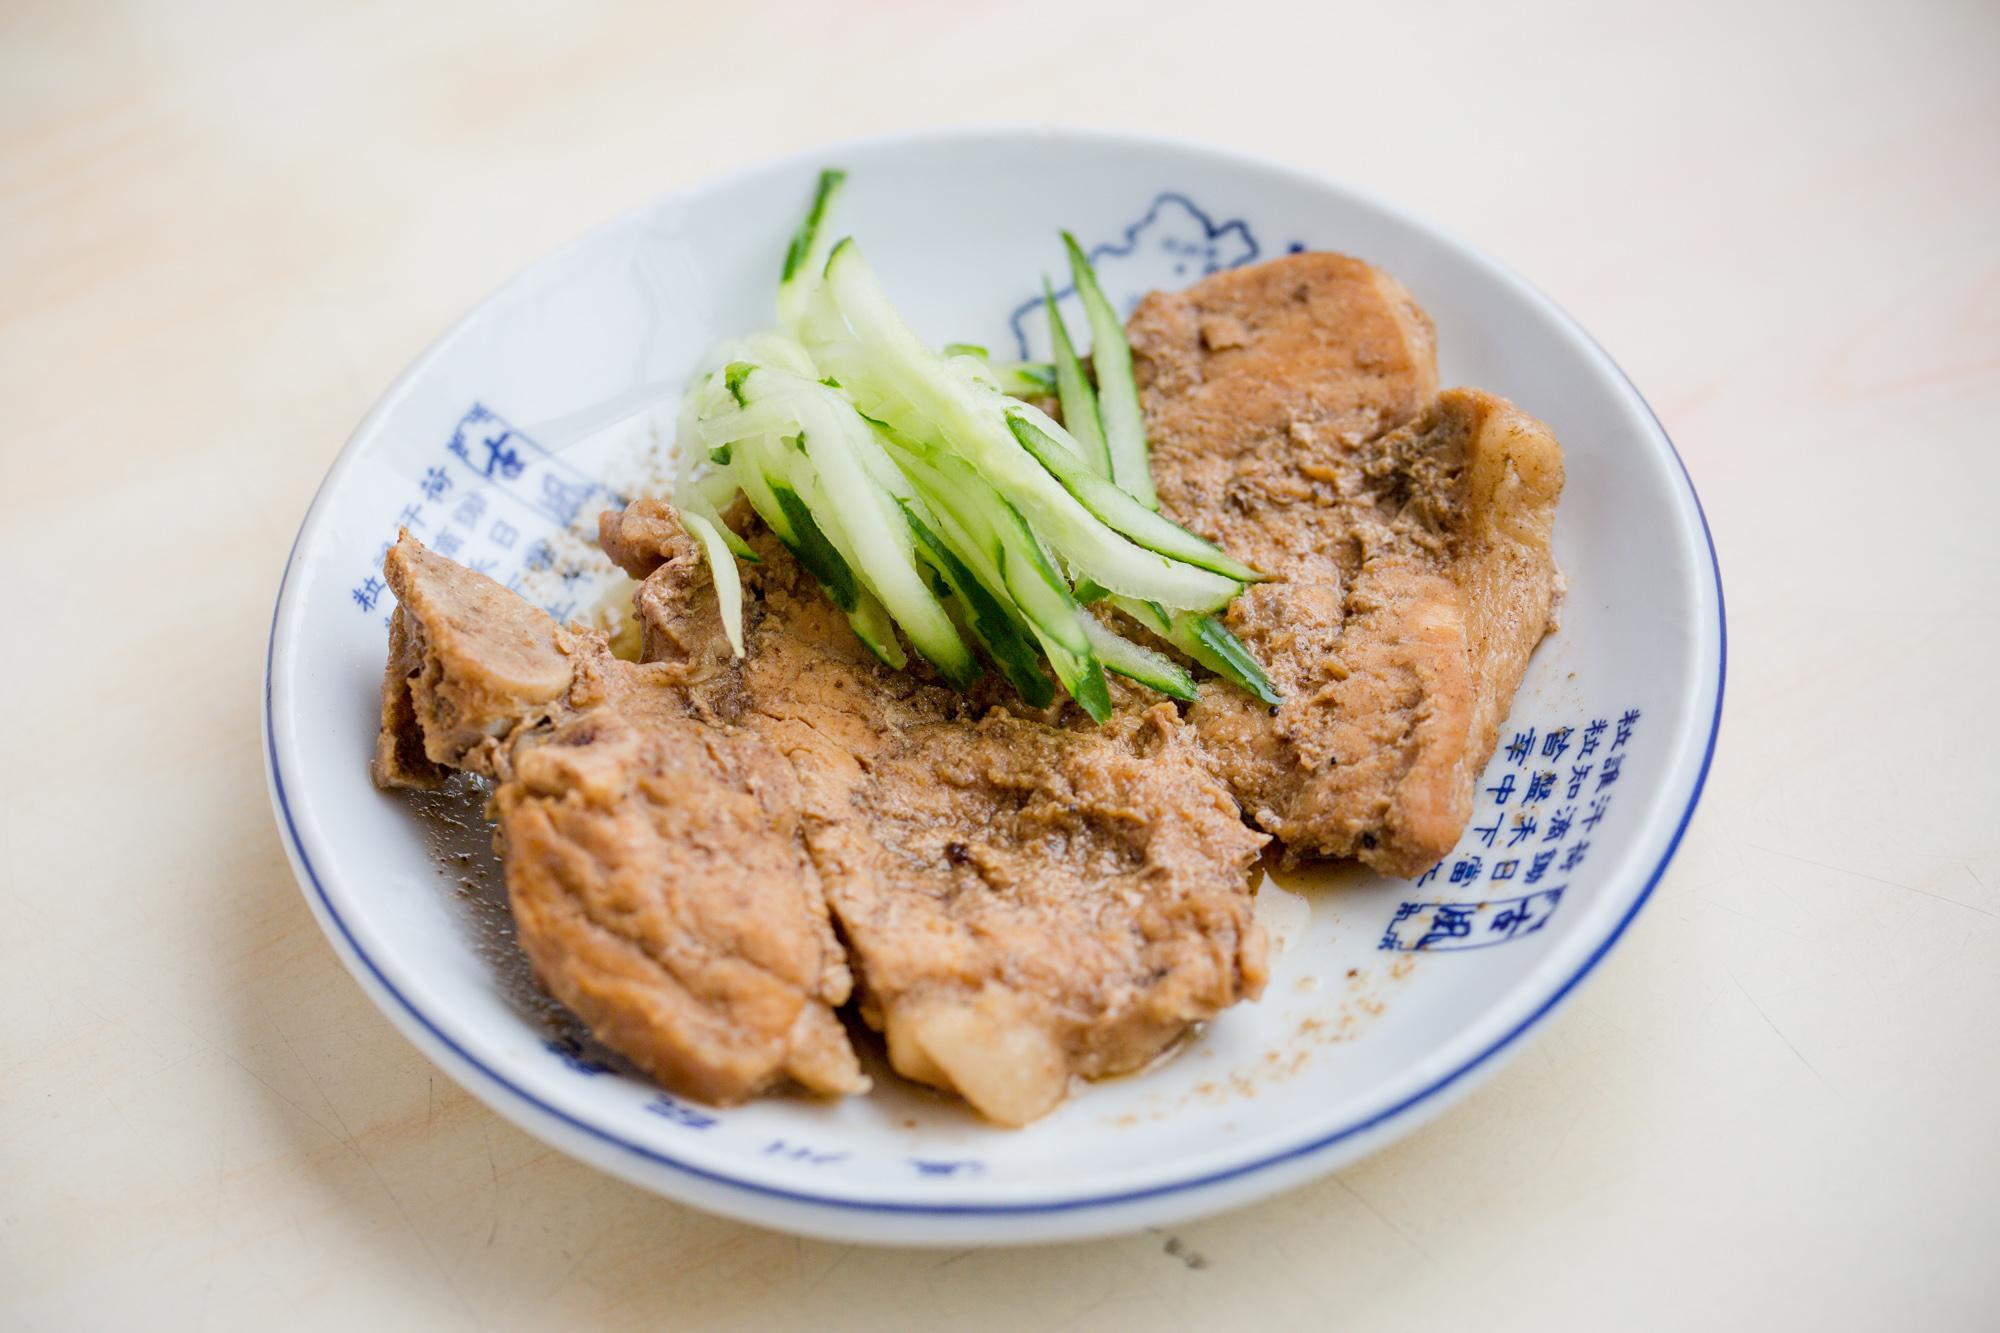 Roasted Pork Chop